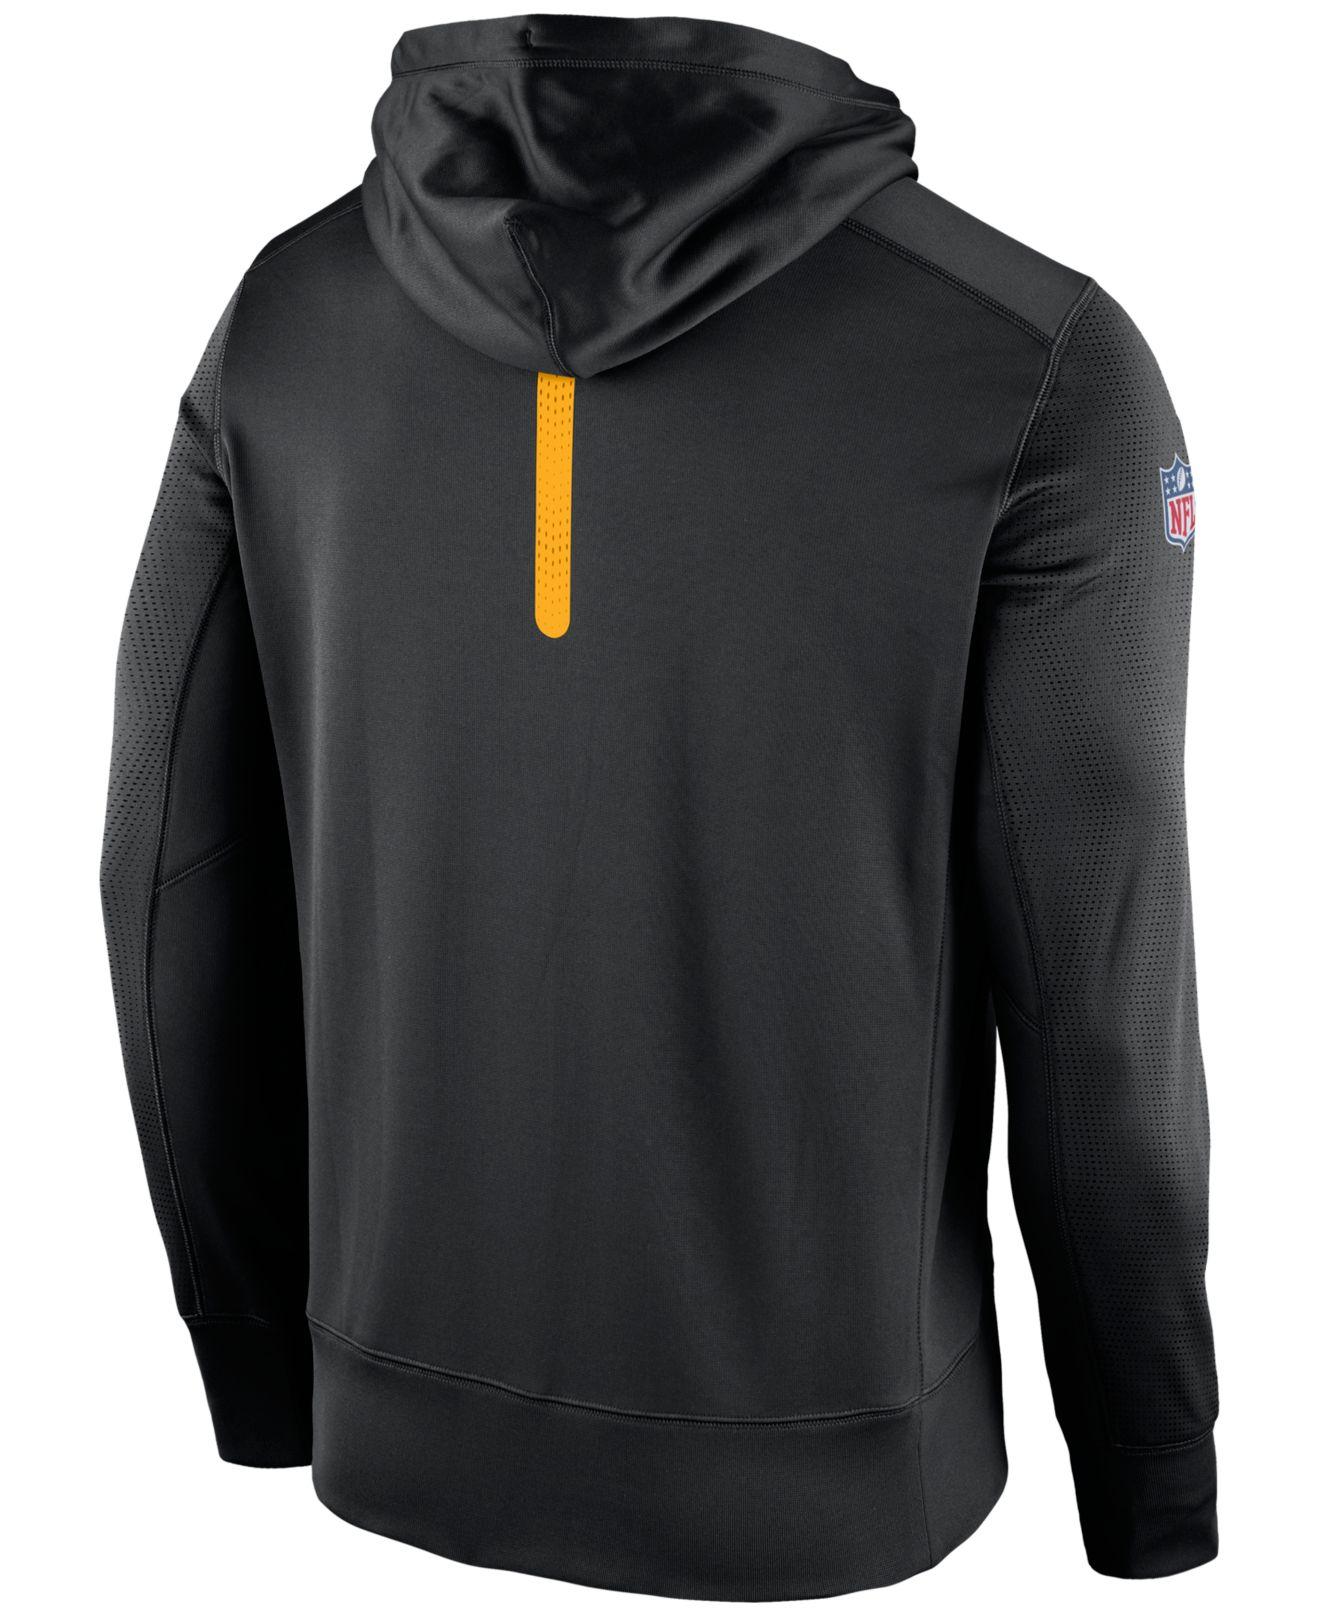 Lyst - Nike Men s Pittsburgh Steelers Sideline Ko Fleece Full-zip ... 52655e783